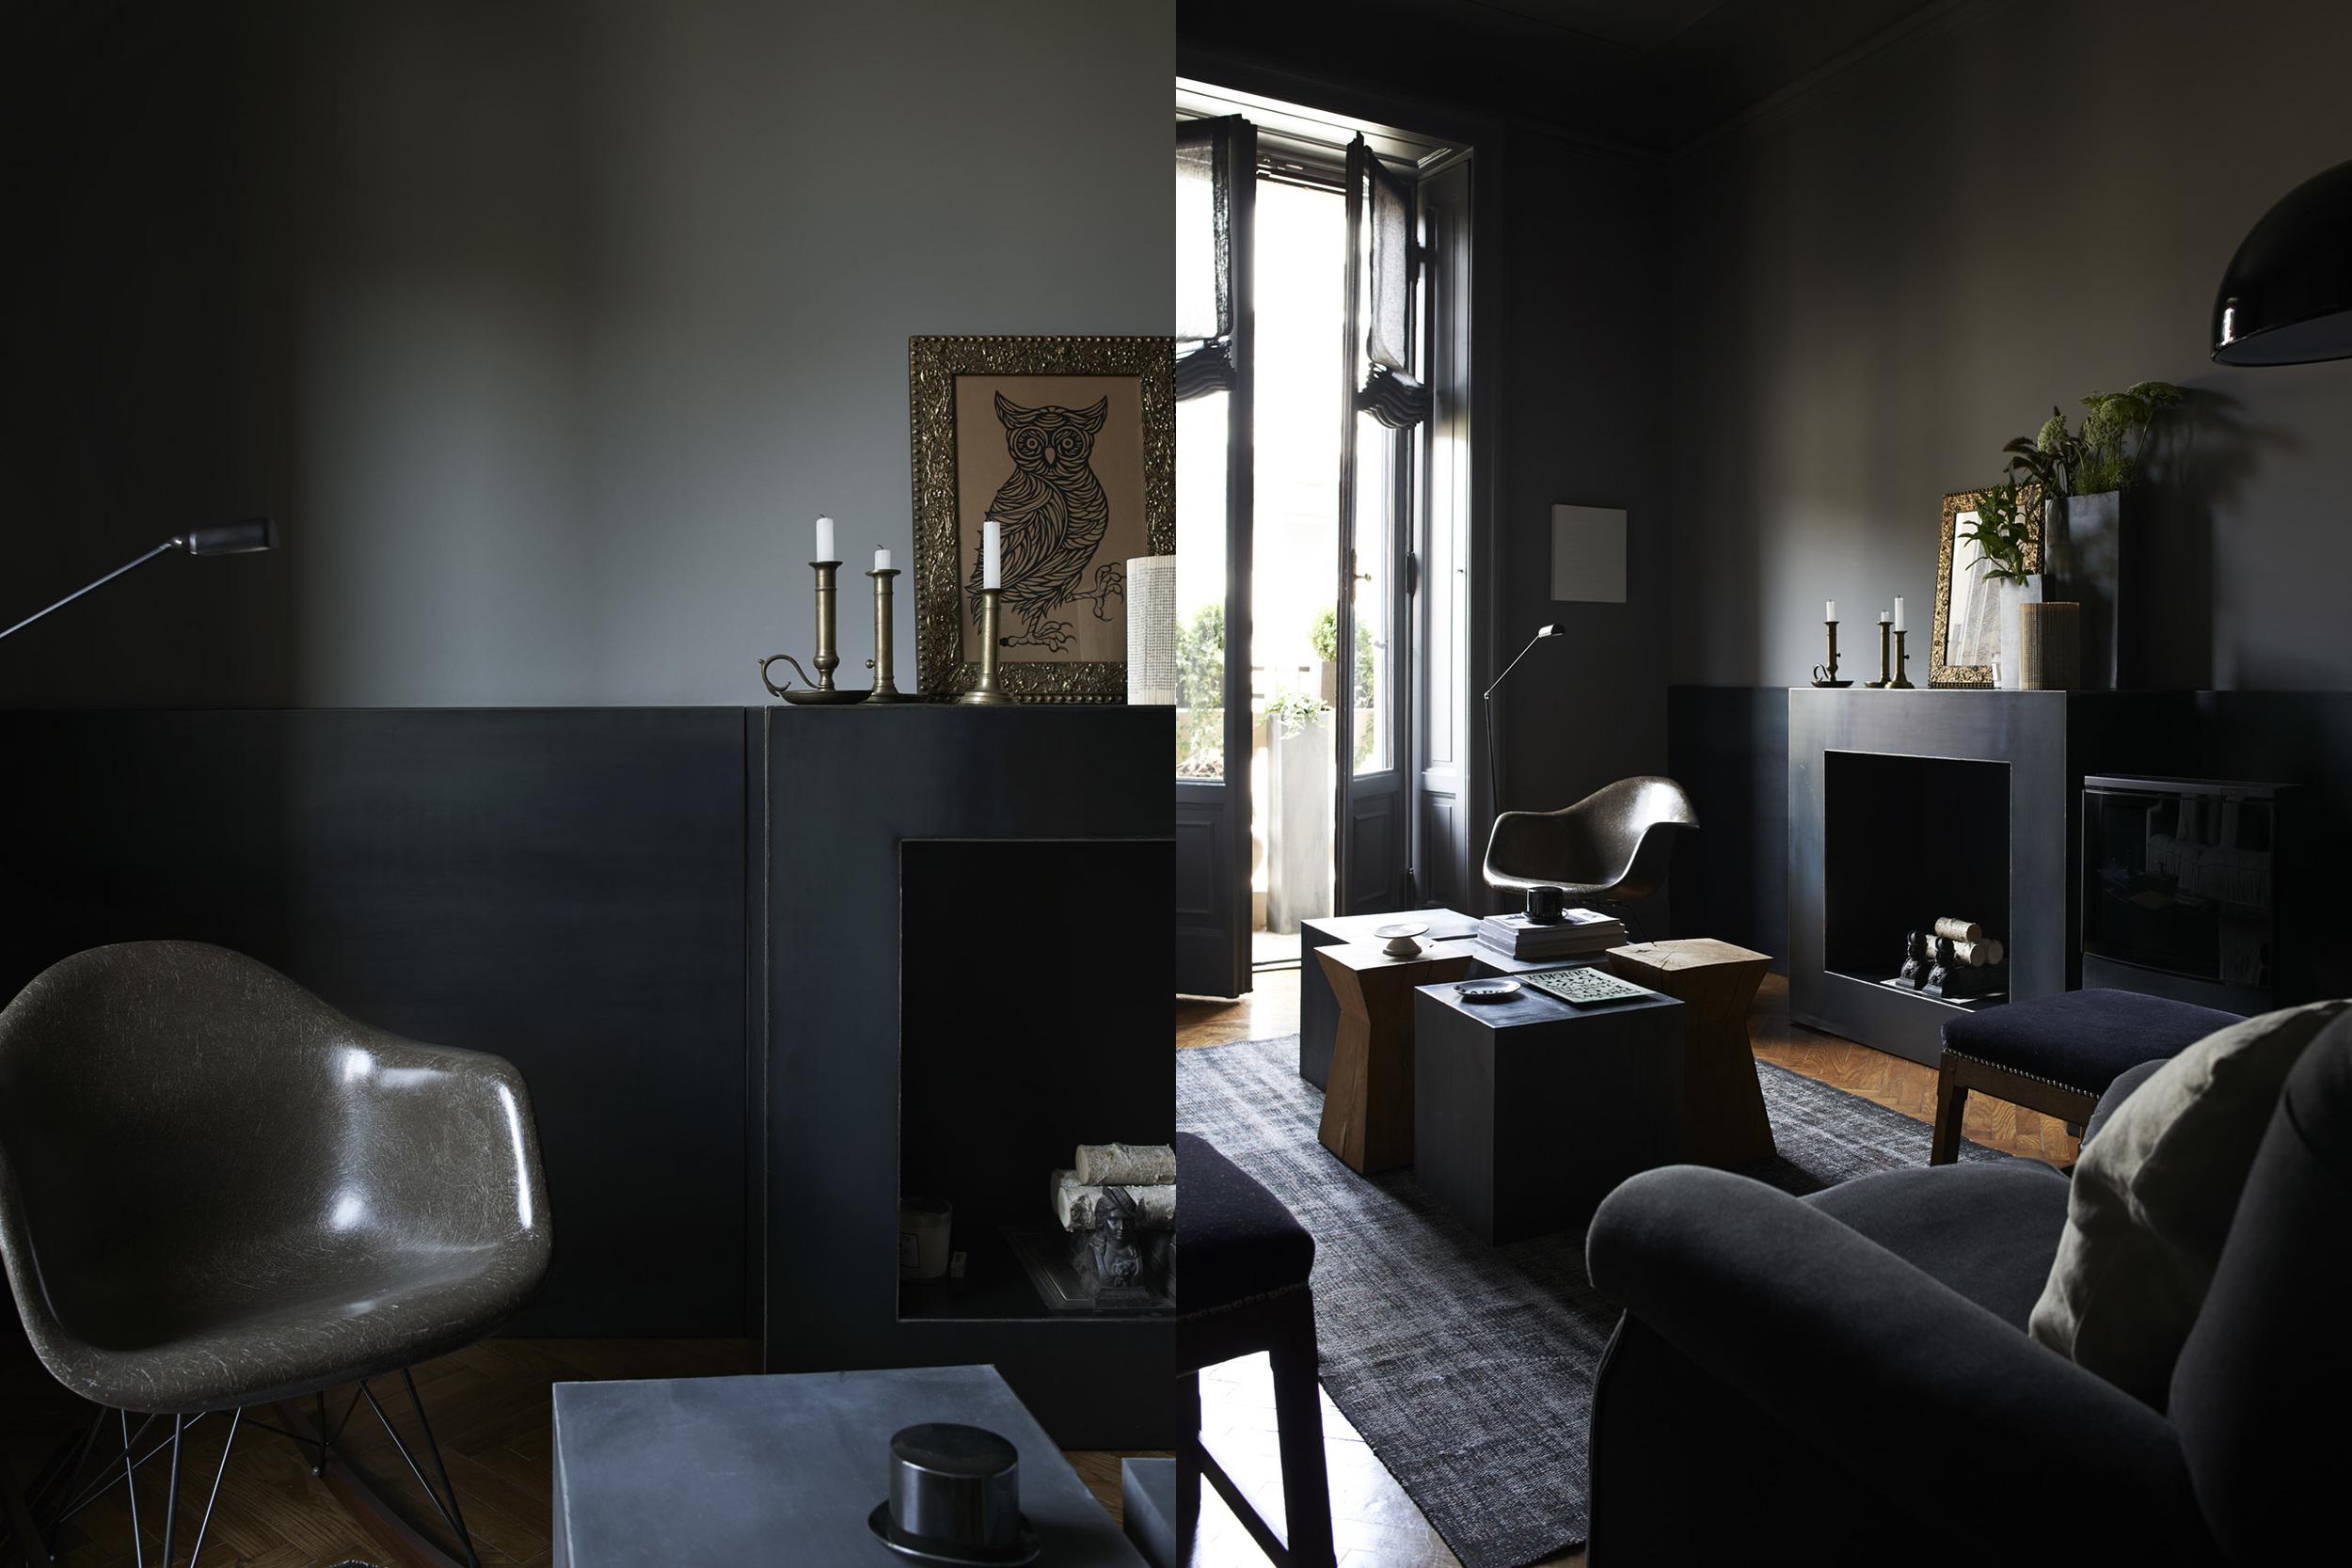 RPS1720_Cavanna_Livingroom_final_0070.jpg